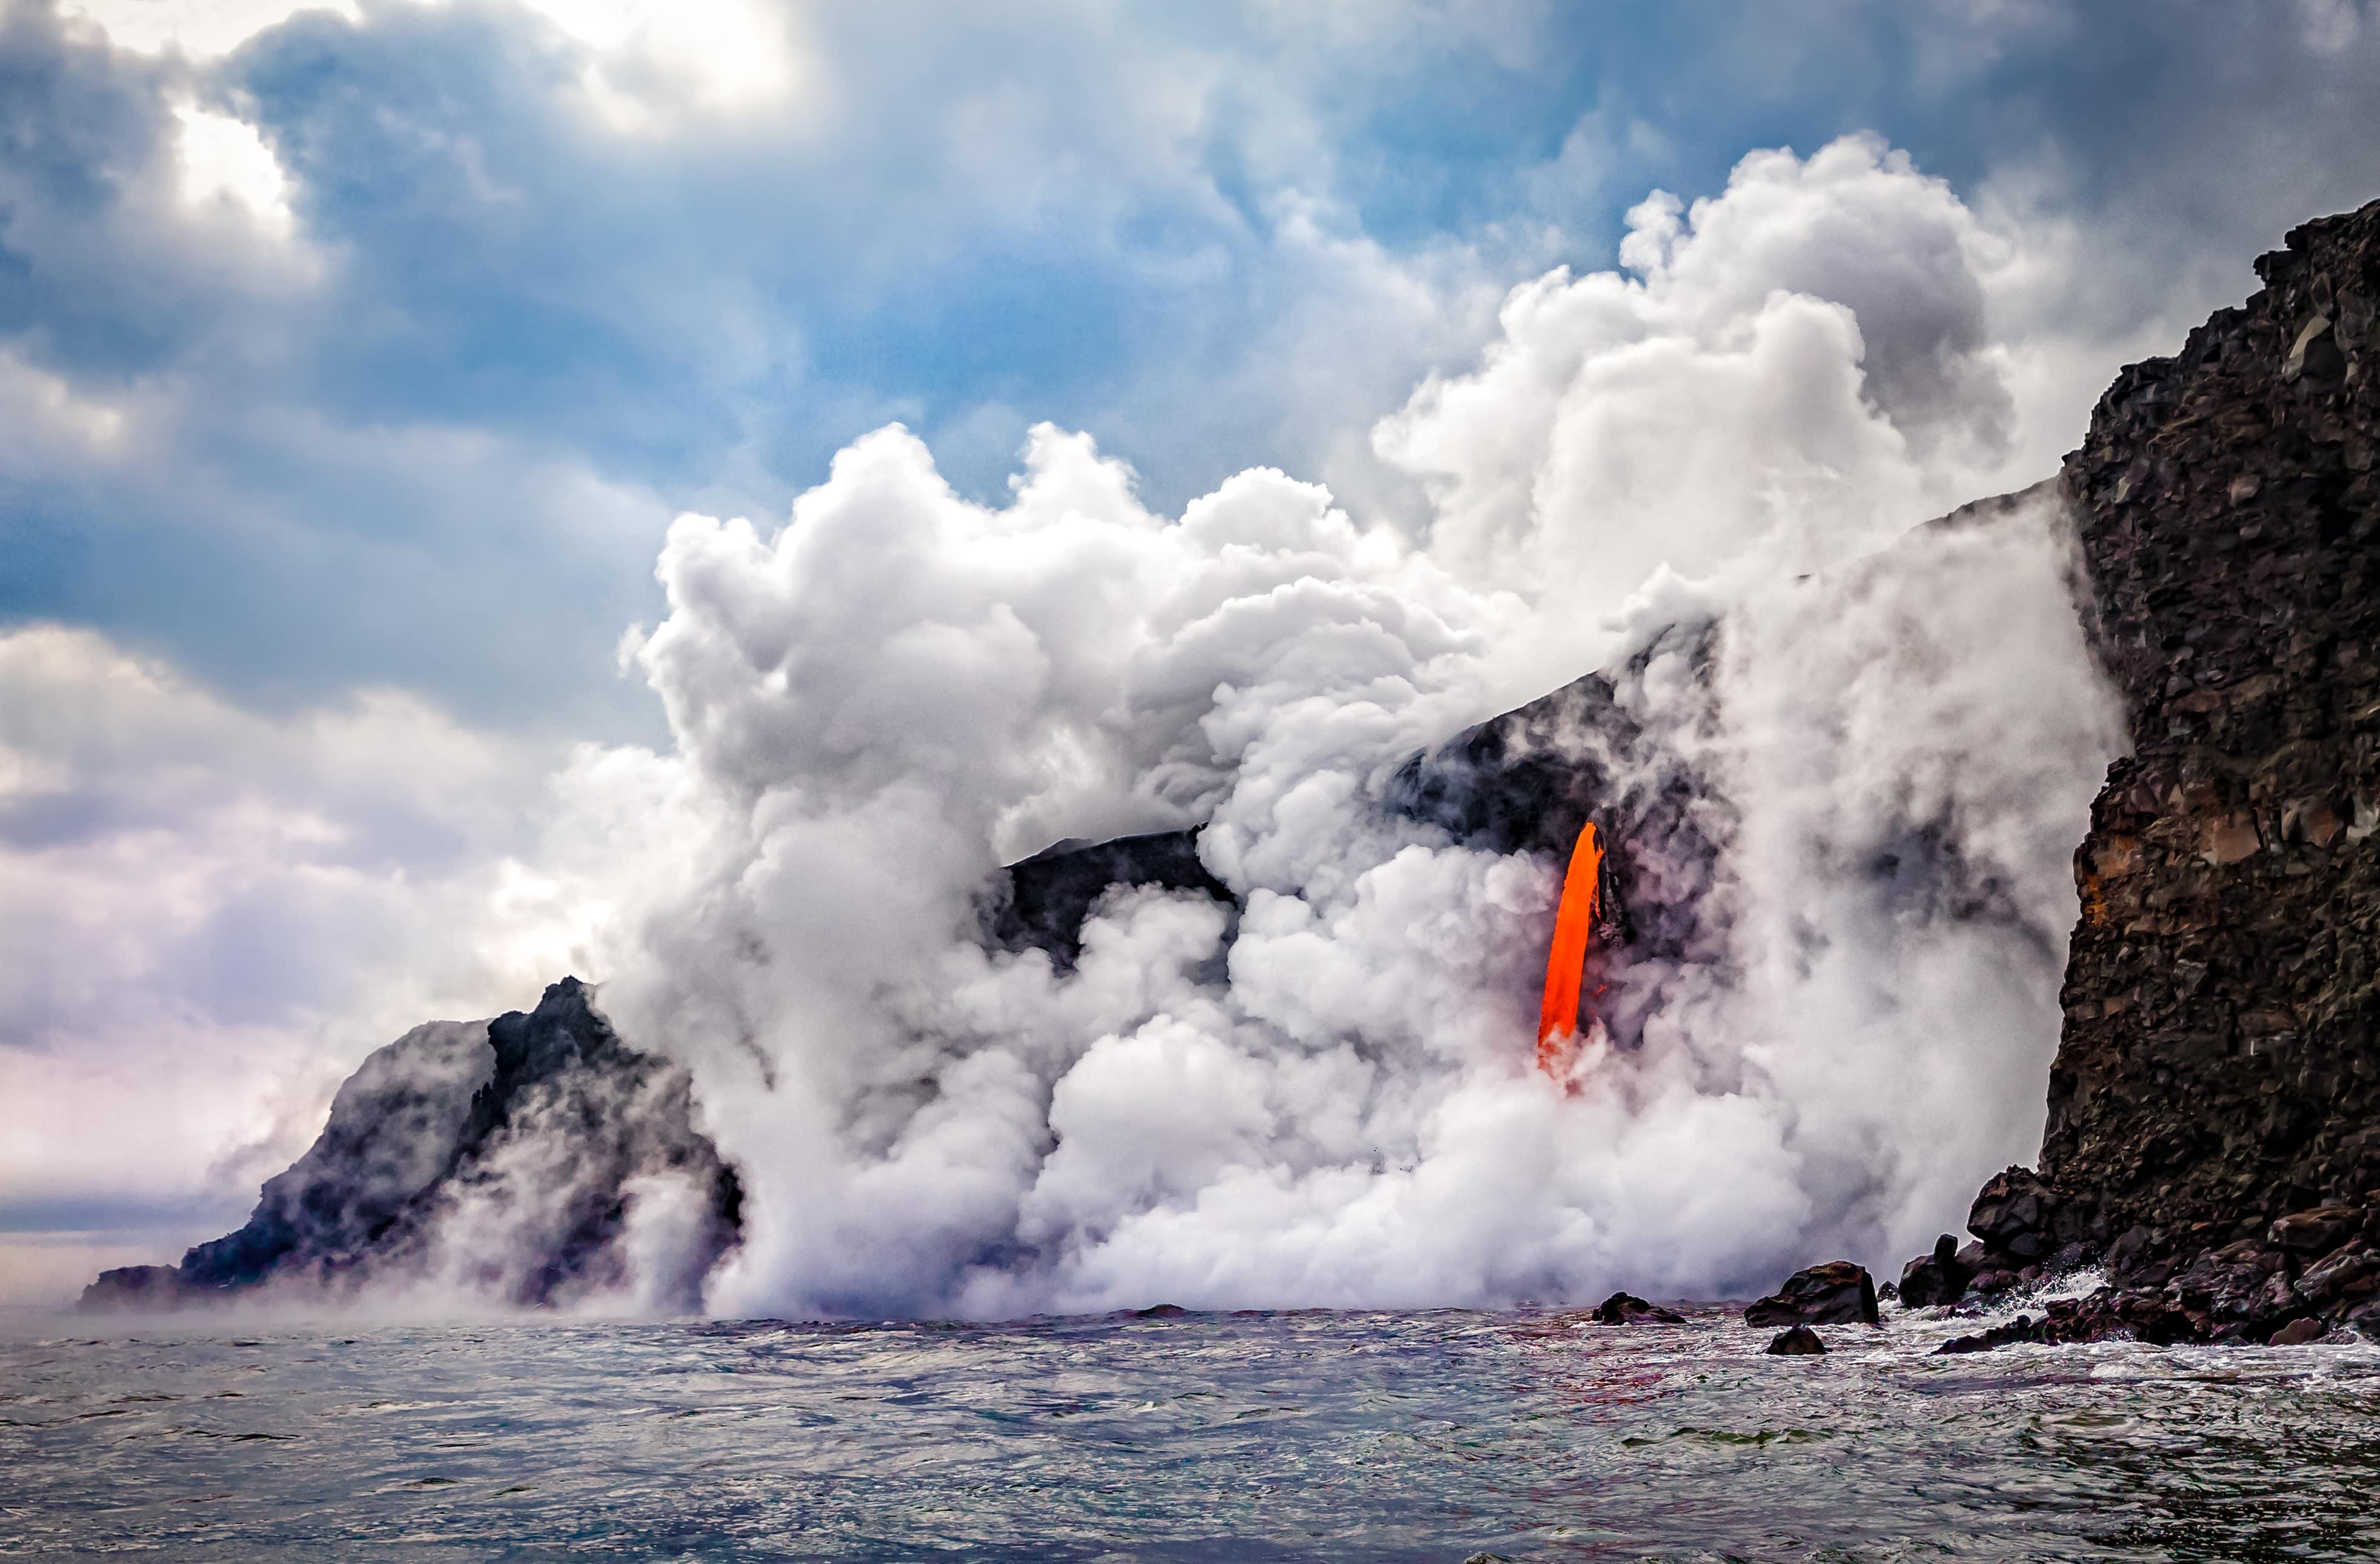 Kamokuna ocean entry in Hawaii's Volcano National Park